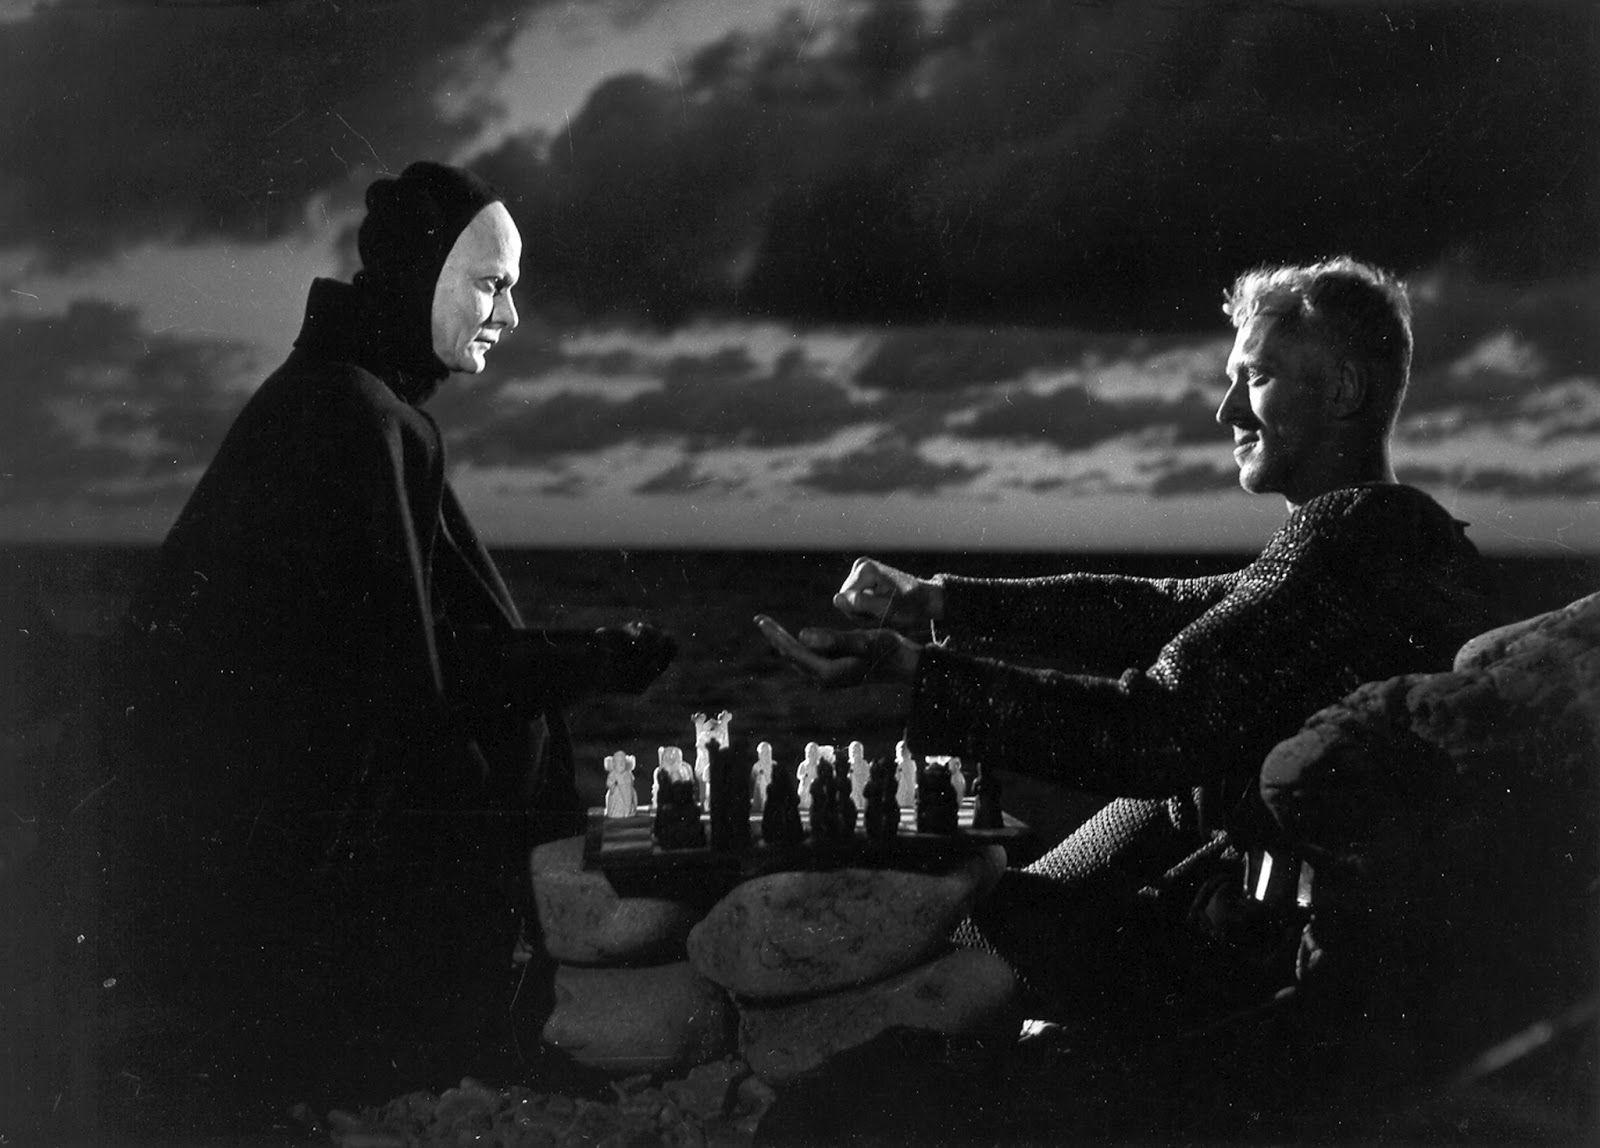 El séptimo sello, de Ingmar Bergman